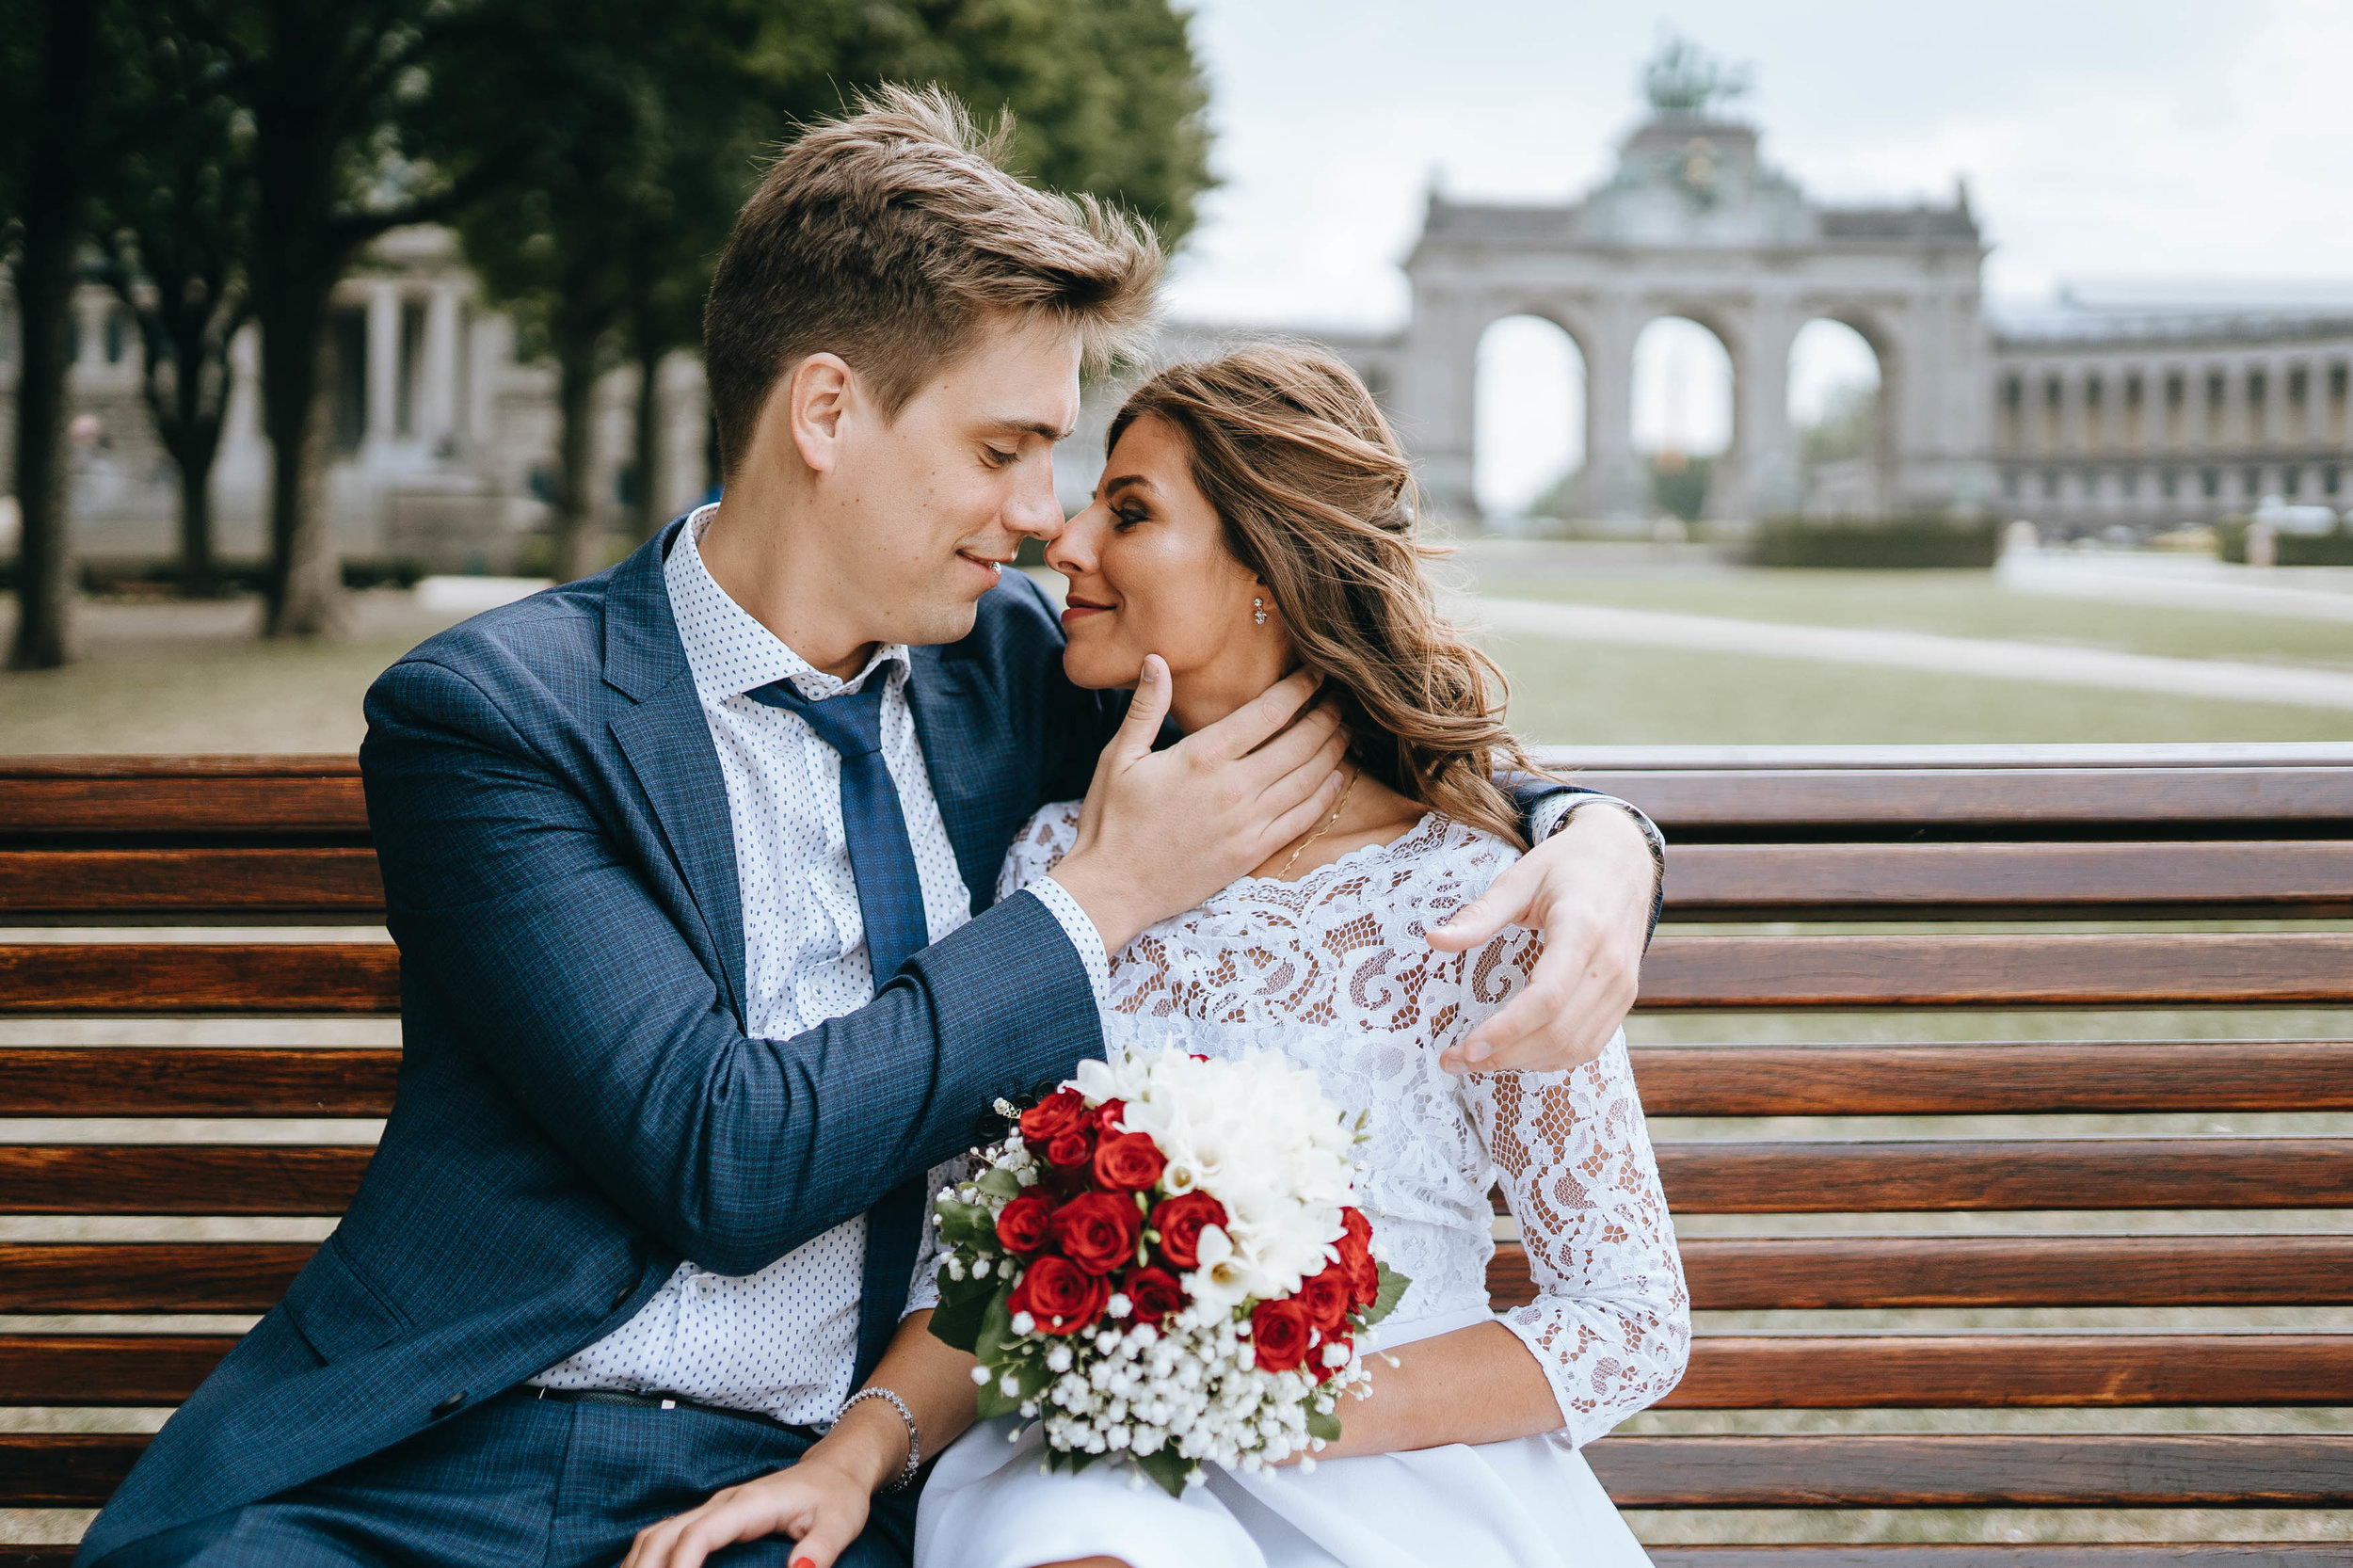 photographe_bruxelles_mariage_cinquantenaire-21.jpg